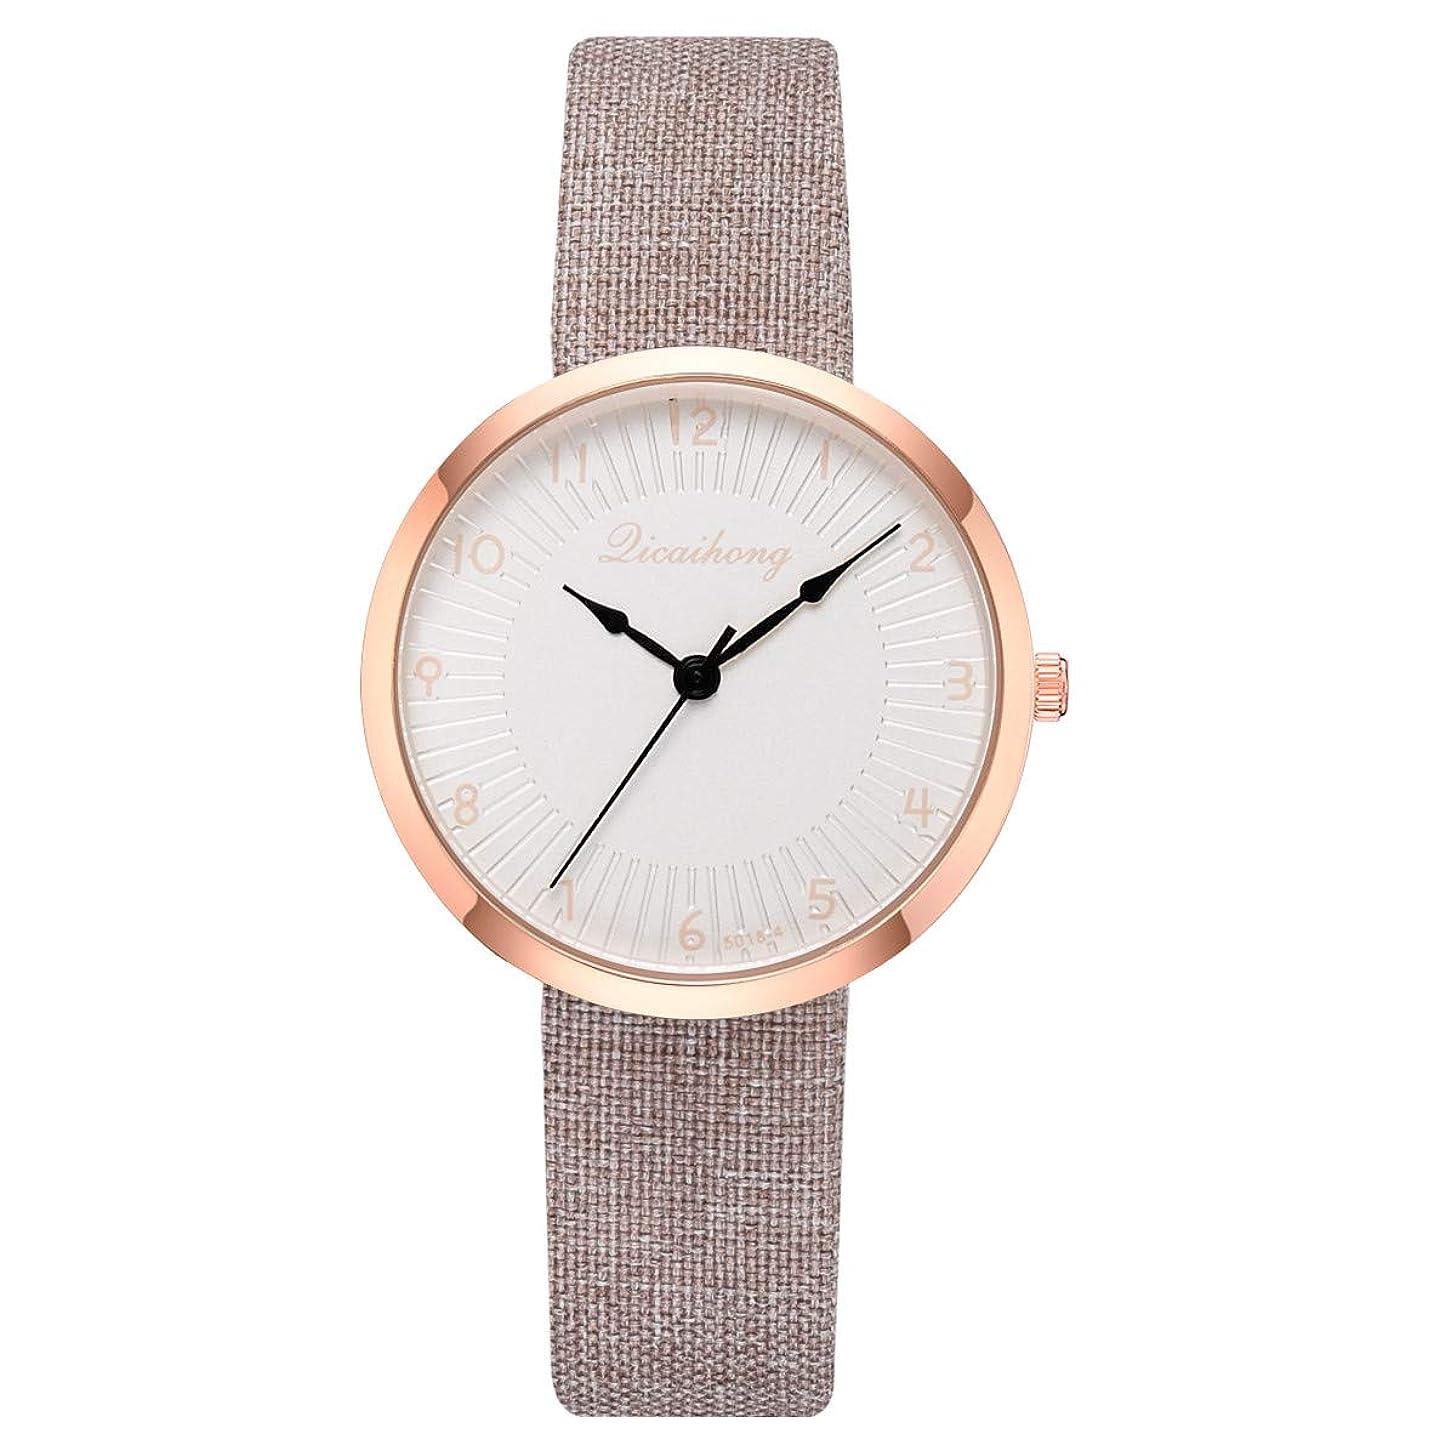 LUCAMORE Womens Leather Watch,Fashion Casual Dress Watches,Arabic Numerals Quartz Ladies Wrist Watch